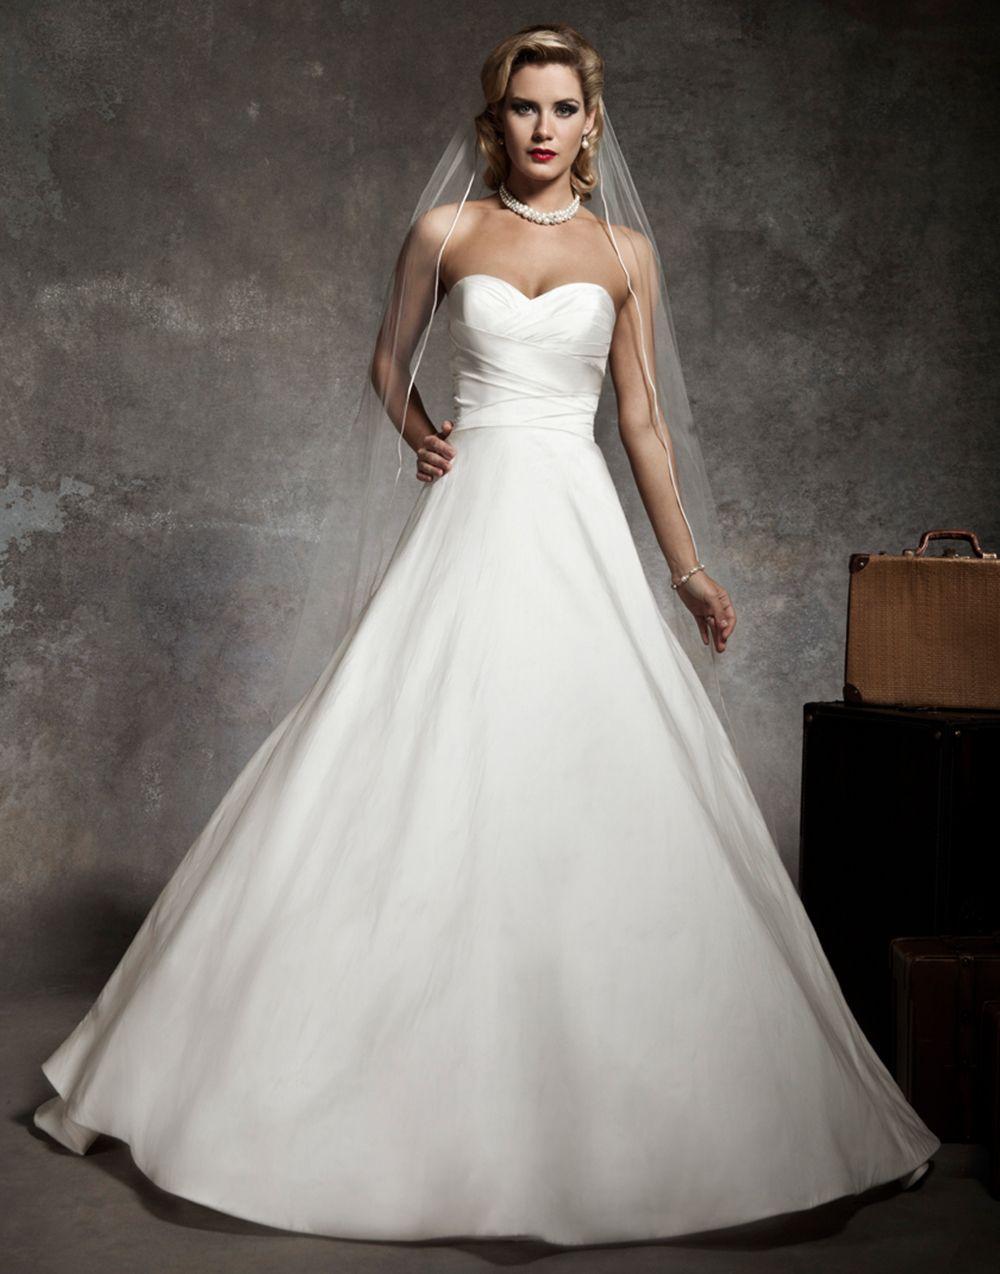 Justin Alexander Wedding Dresses Style 8635 Strapless Sweetheart